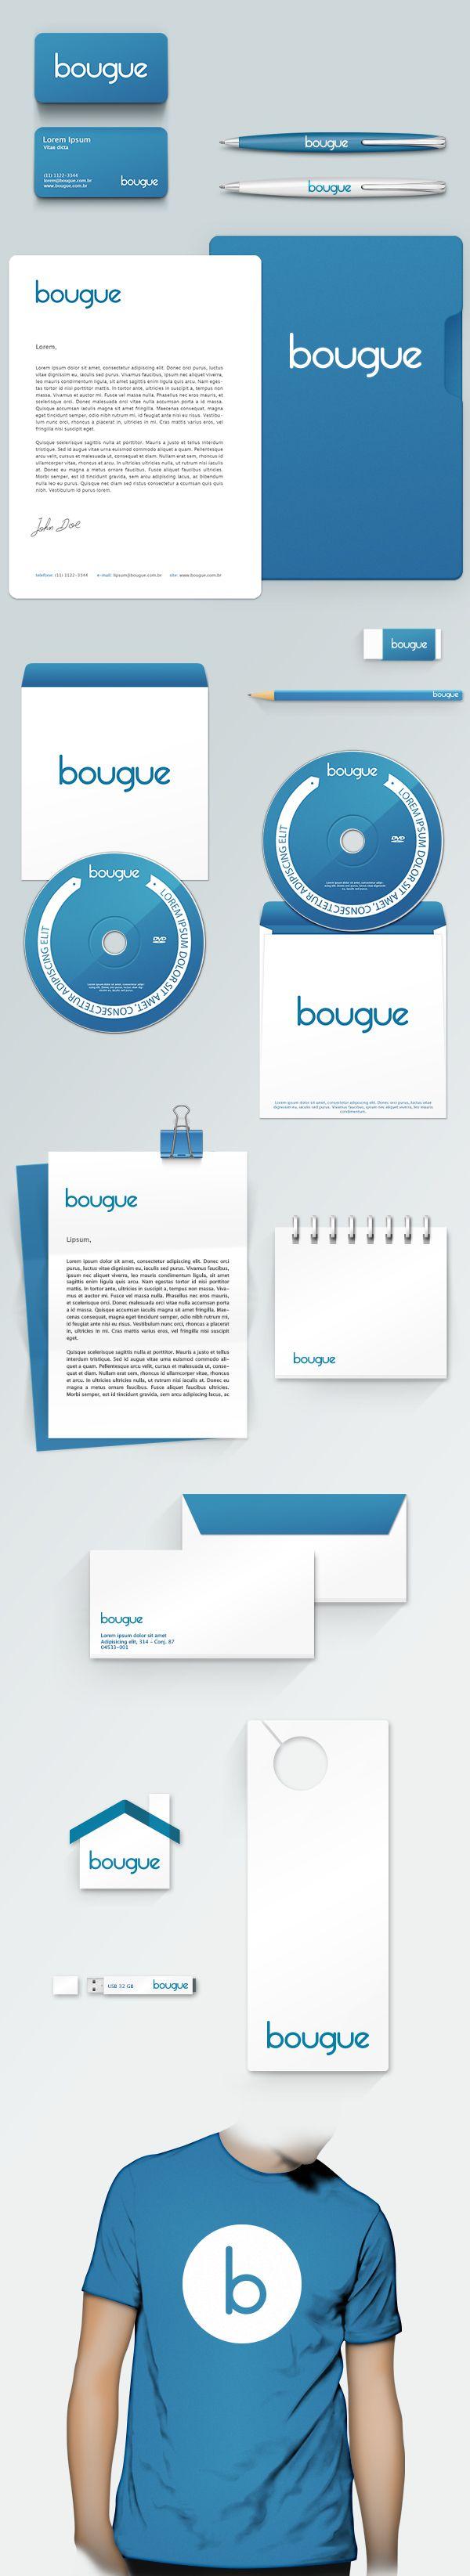 50 best Business Card Design images on Pinterest